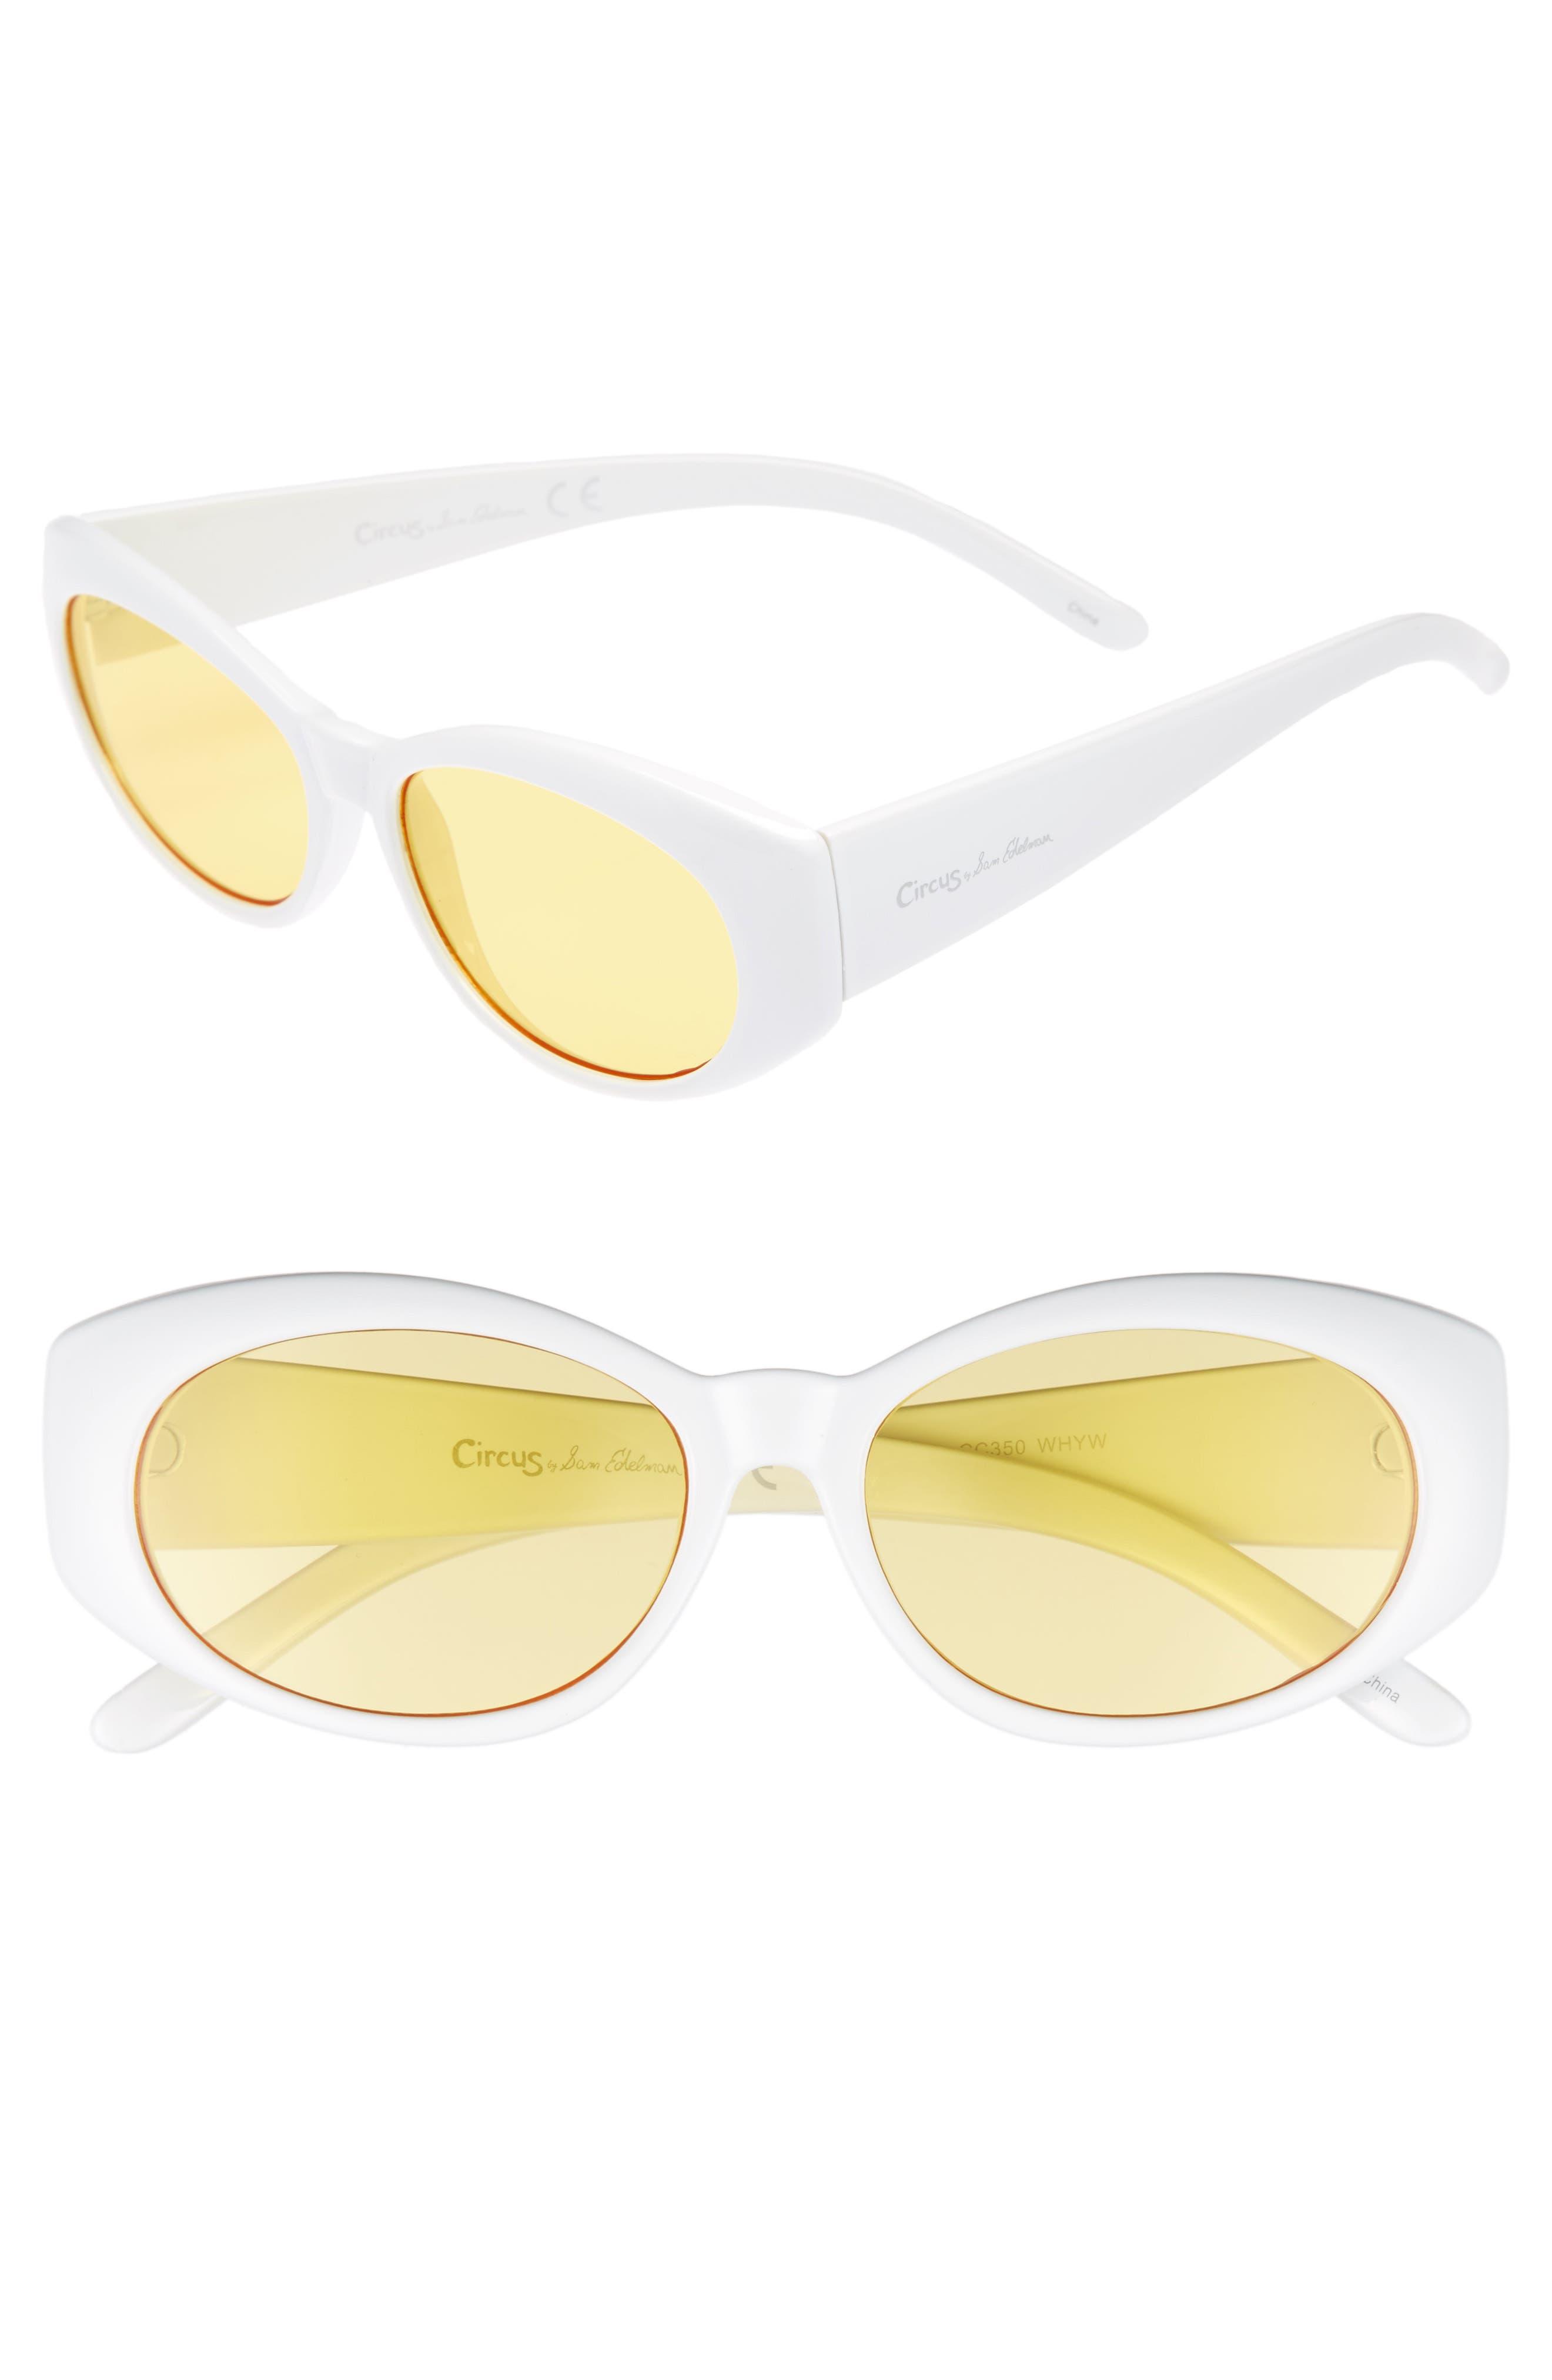 68mm Oval Sunglasses,                         Main,                         color, 102